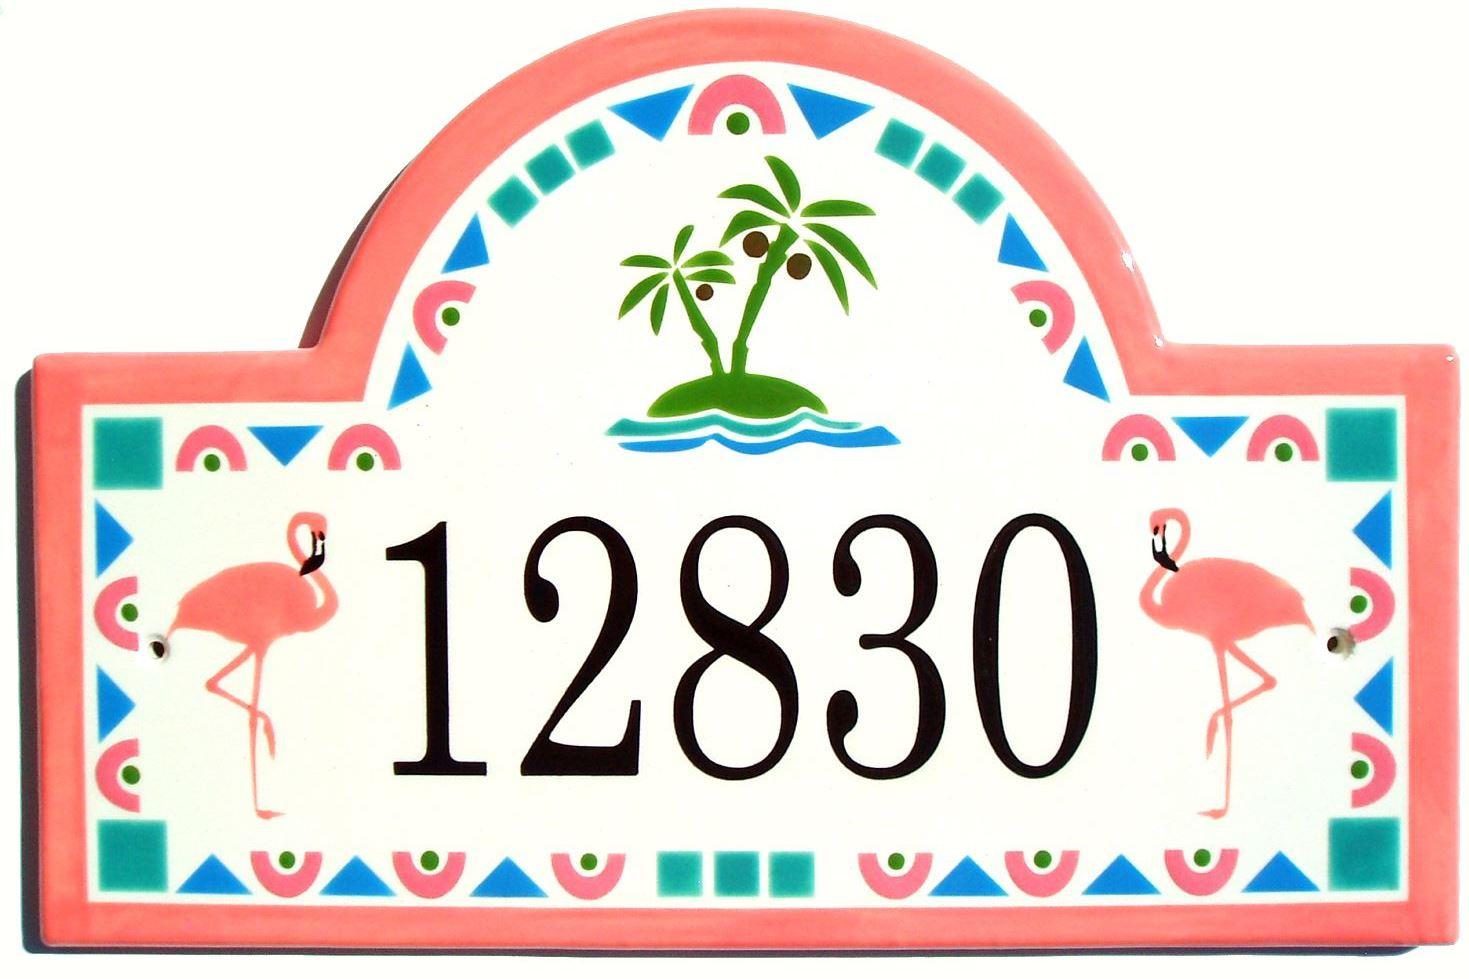 flamingo-house-number-plaque.jpg